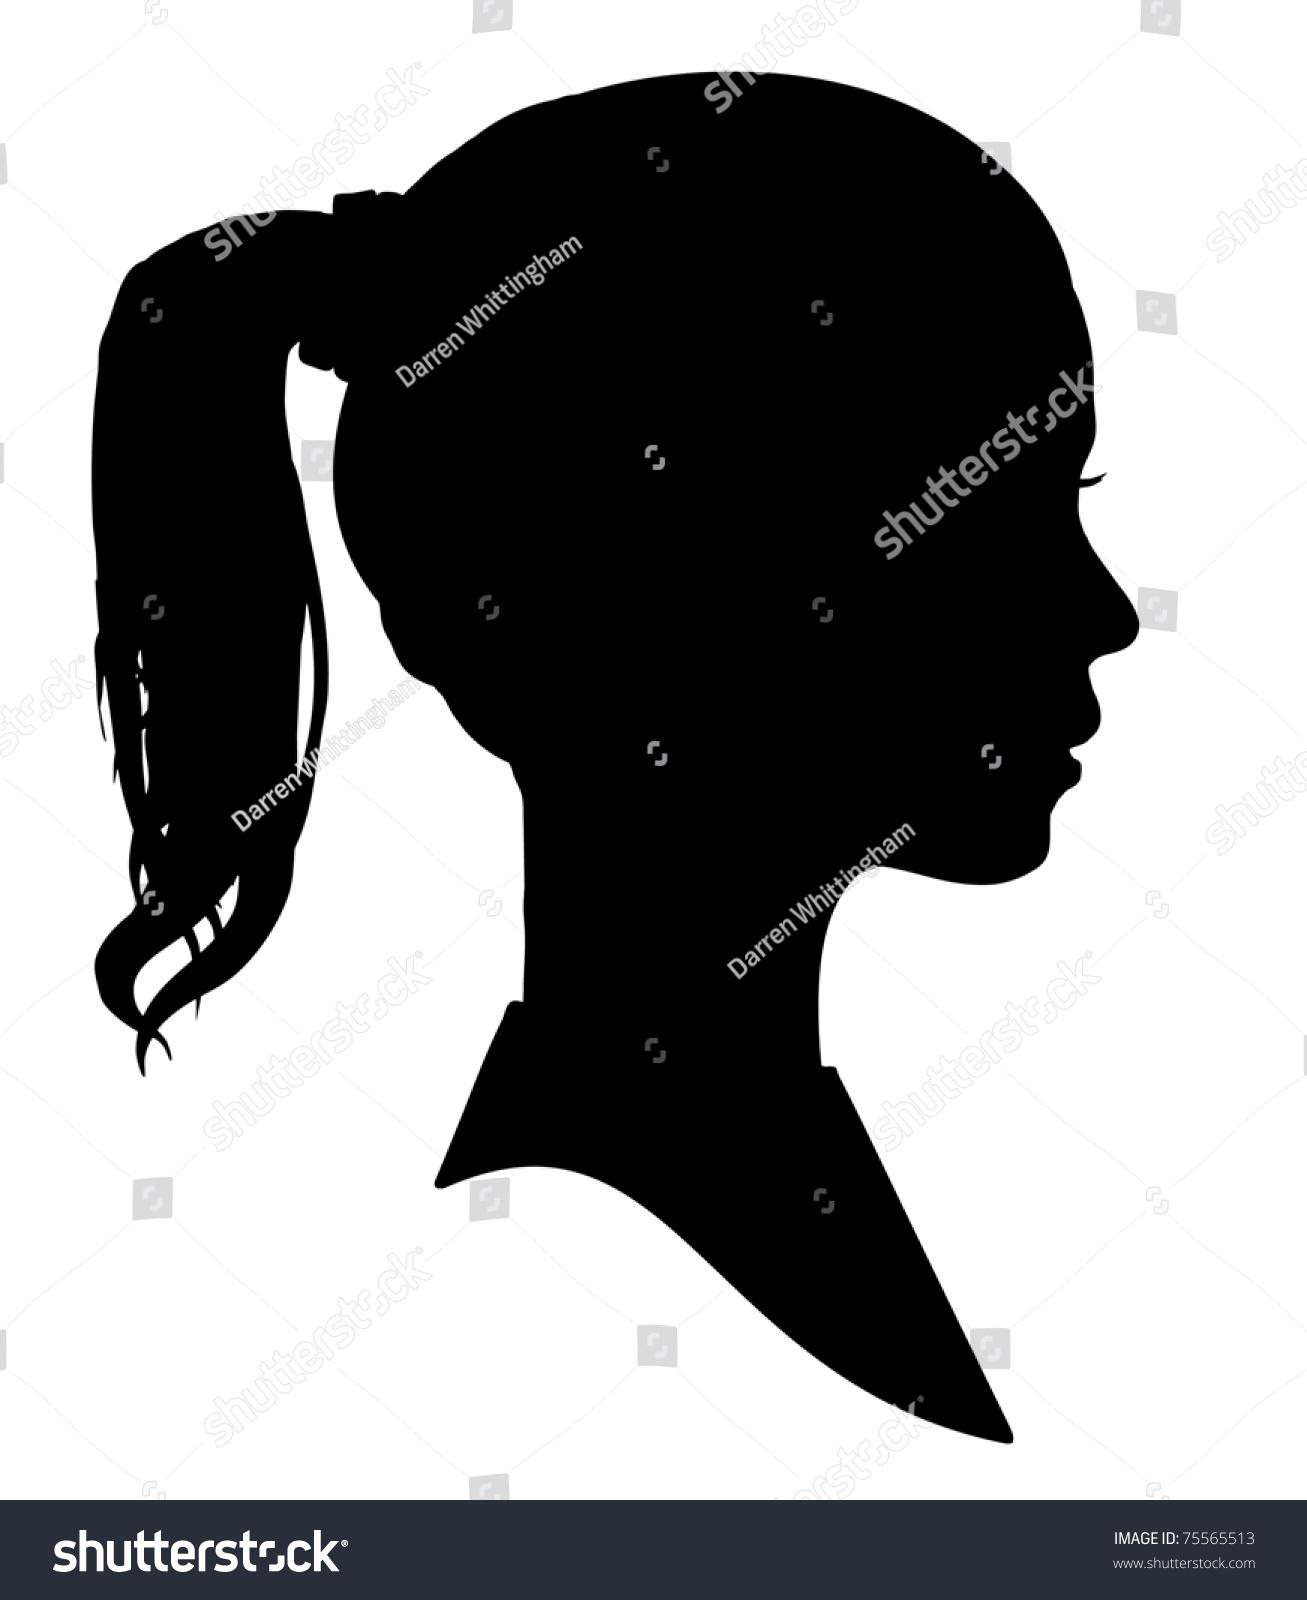 Silhouette Of A Girls Head Stock Photo 75565513 : Shutterstock |Girl Silhoutte